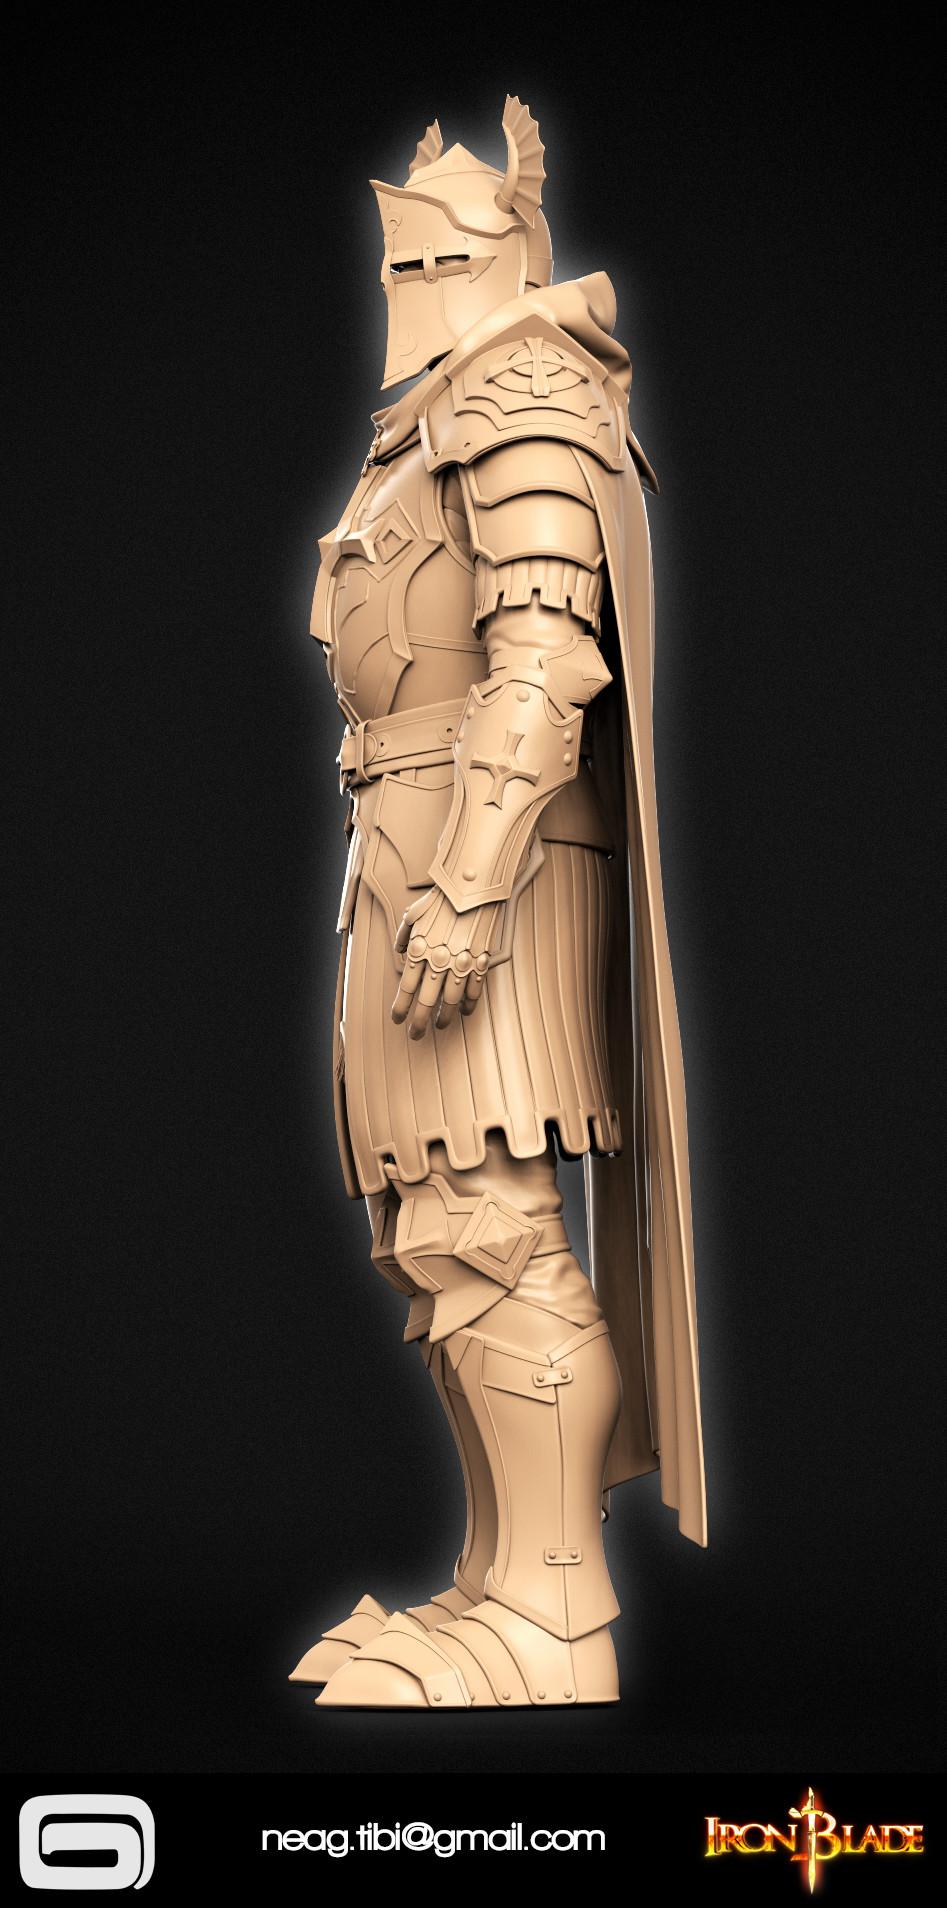 Tibi neag tibi neag iron blade templarb high 03